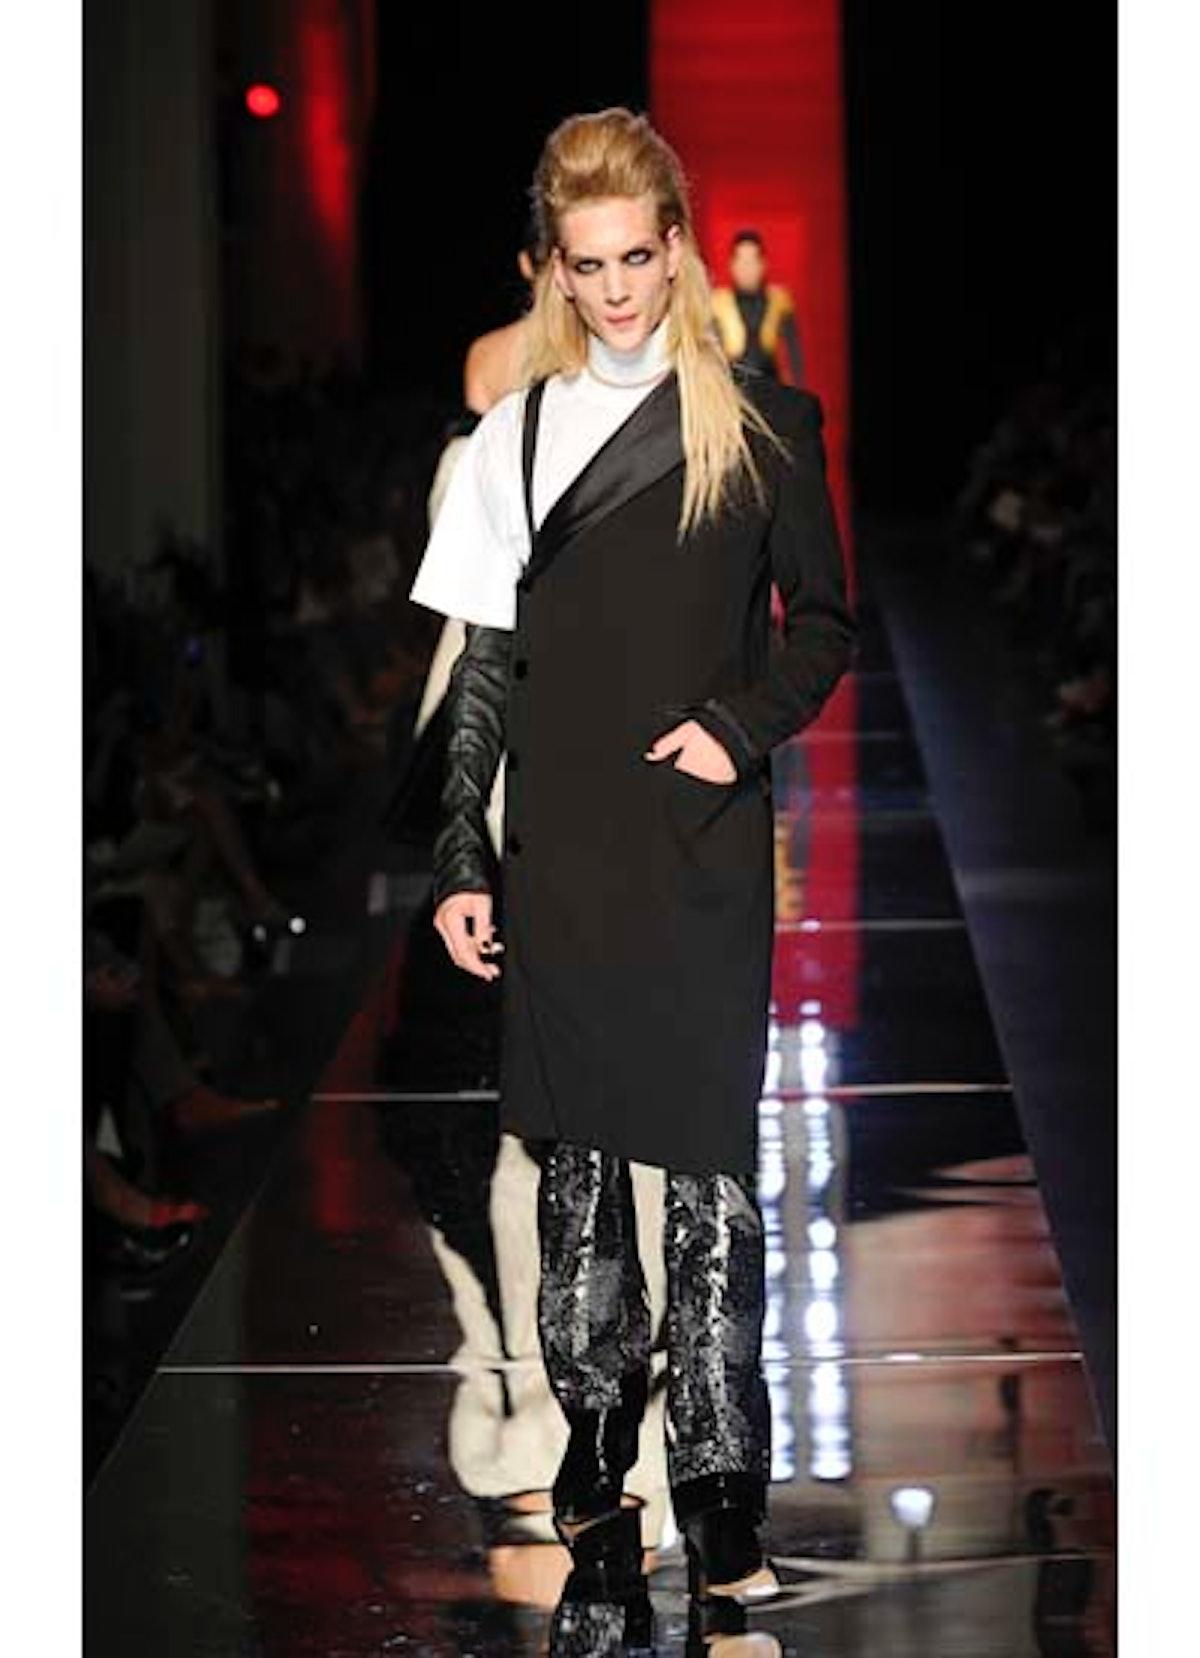 fass-jean-paul-gaultier-couture-2012-runway-39-v.jpg